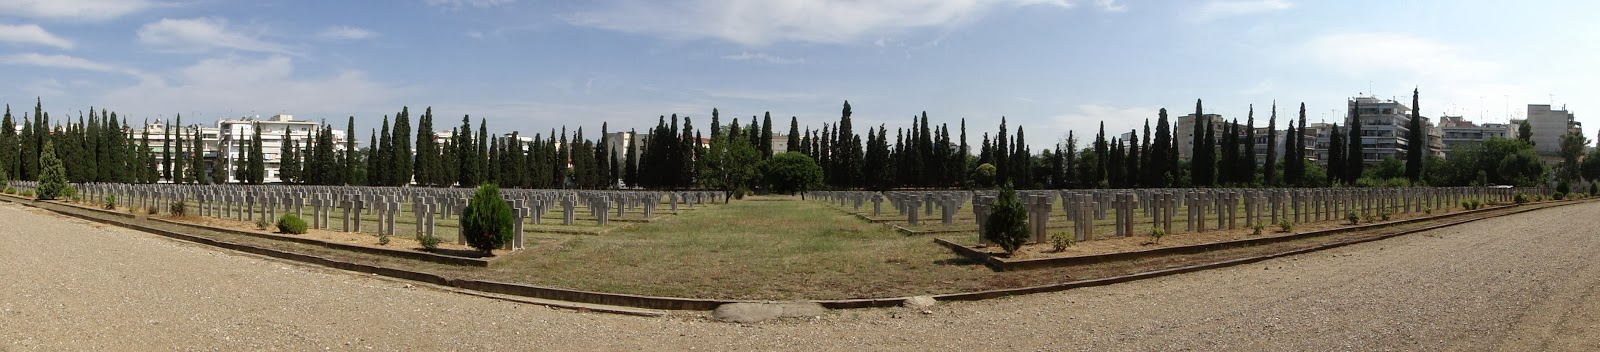 Memorial_park_of_Zeitenlik,_Thessaloniki,_French_sector-Τα συμμαχικά νεκροταφεία του Ζέιτενλικ